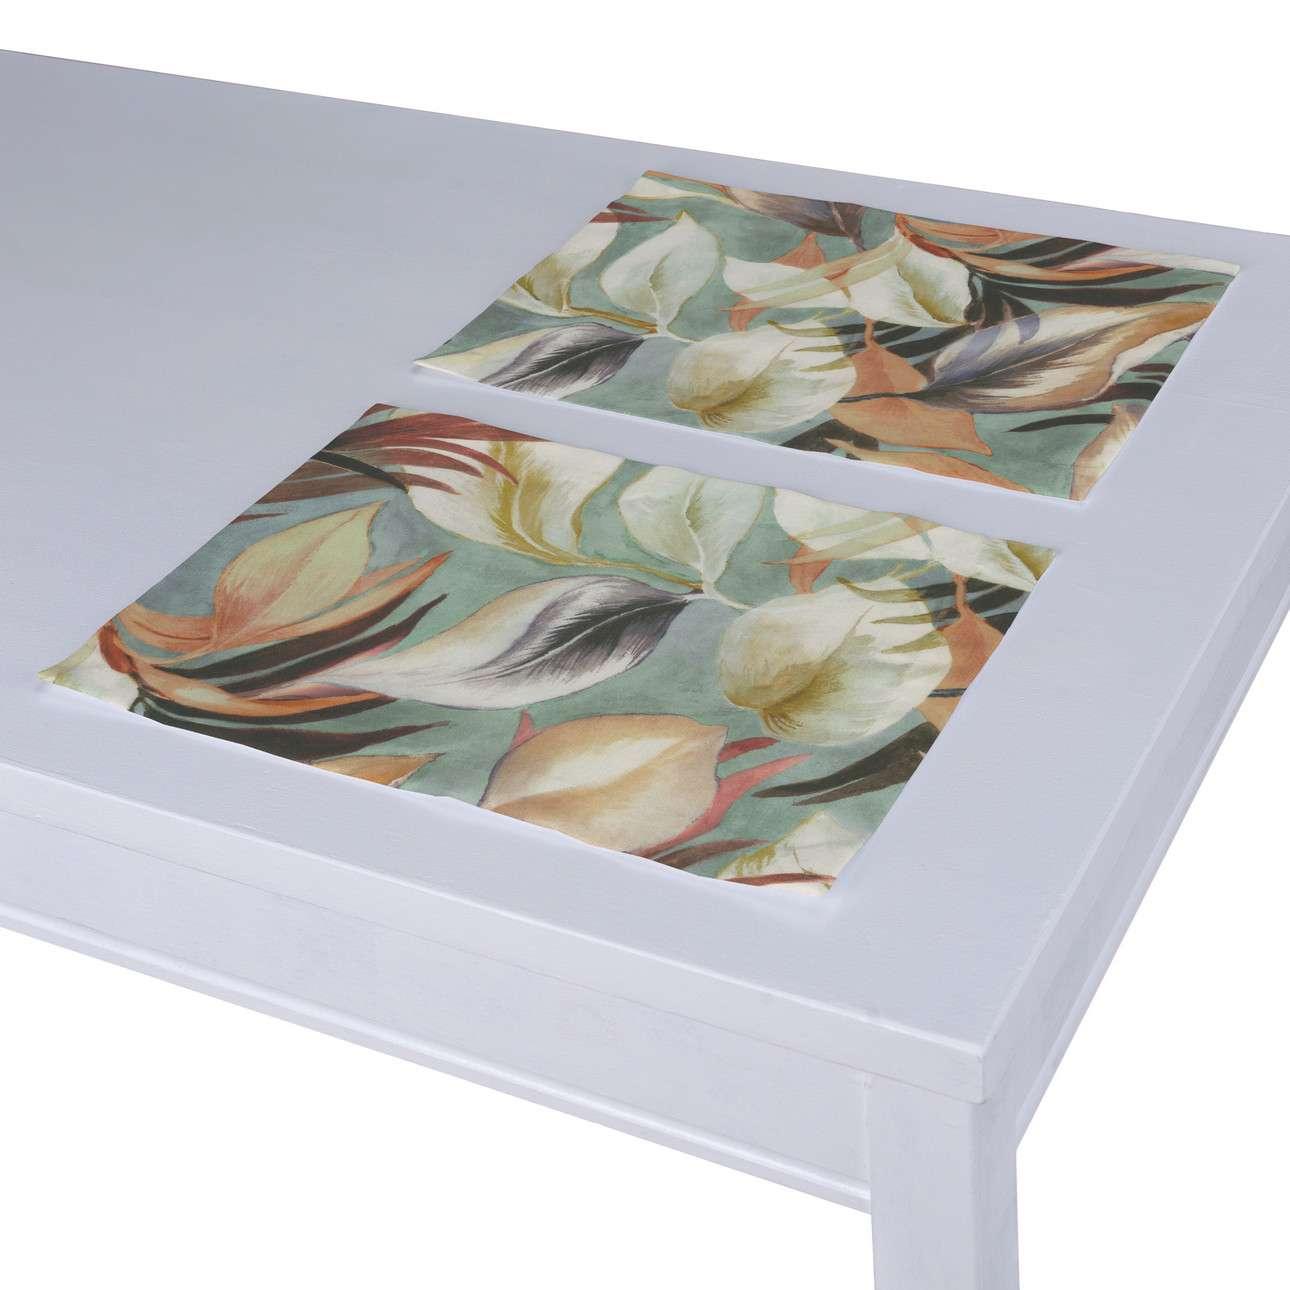 Podkładka 2 sztuki w kolekcji Abigail, tkanina: 143-61